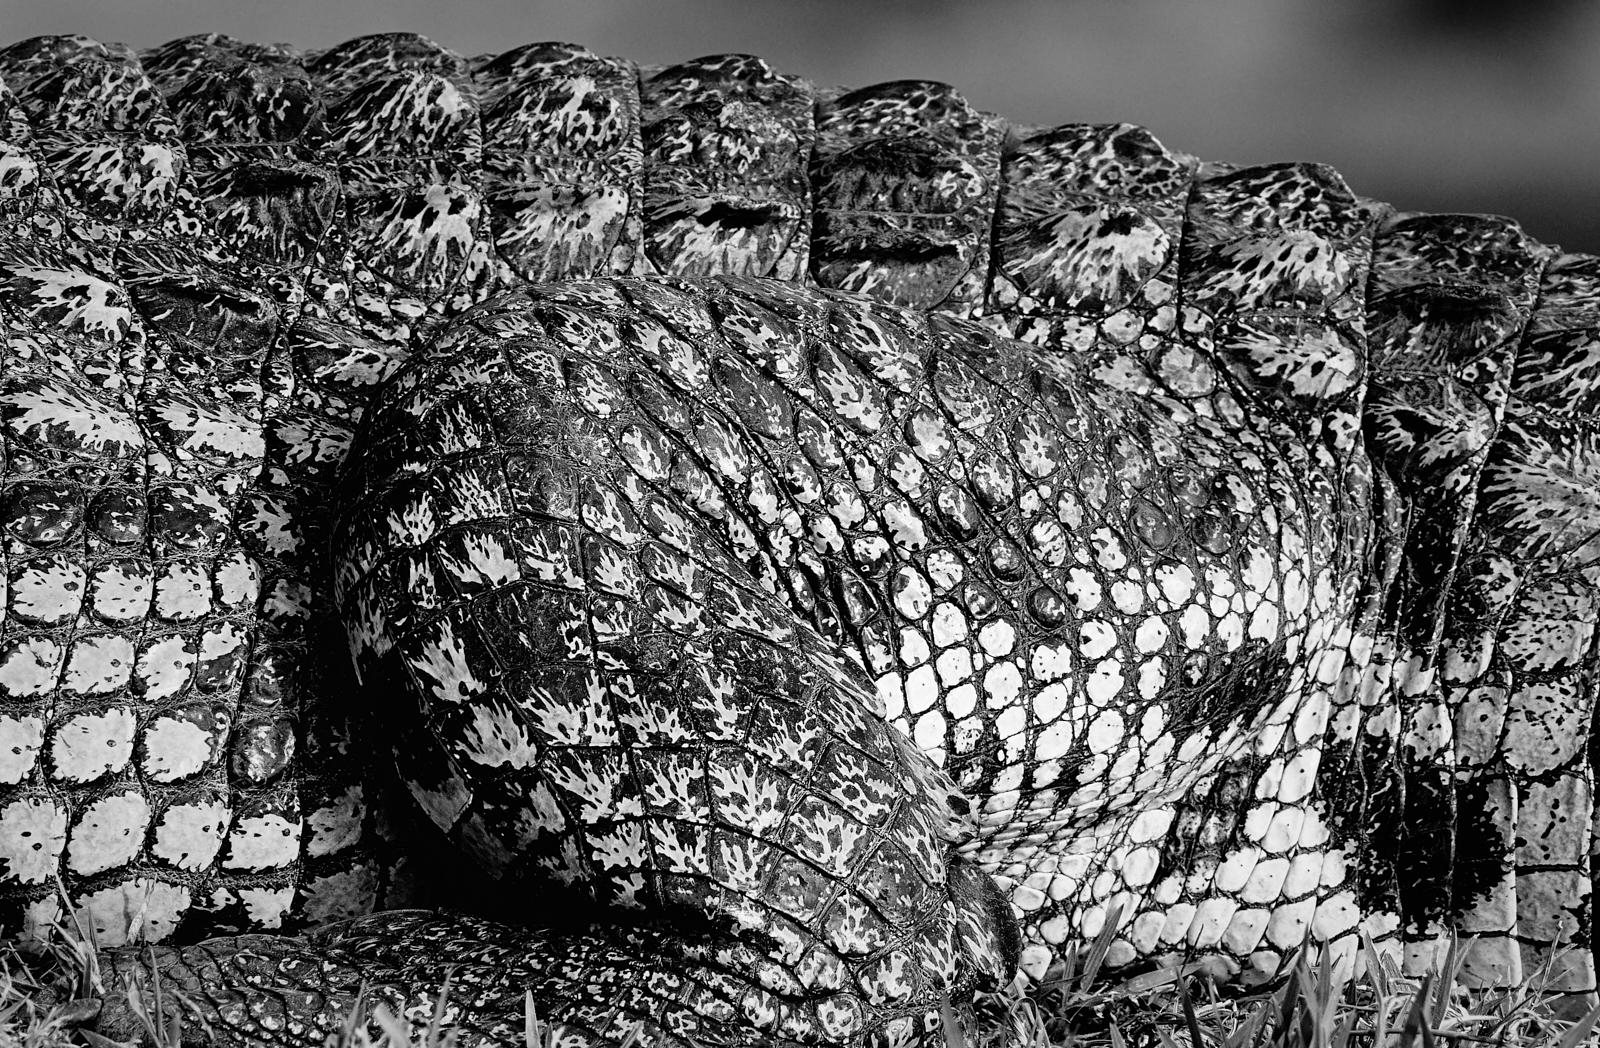 Croc detailed 1600x1200 sRGB.jpg